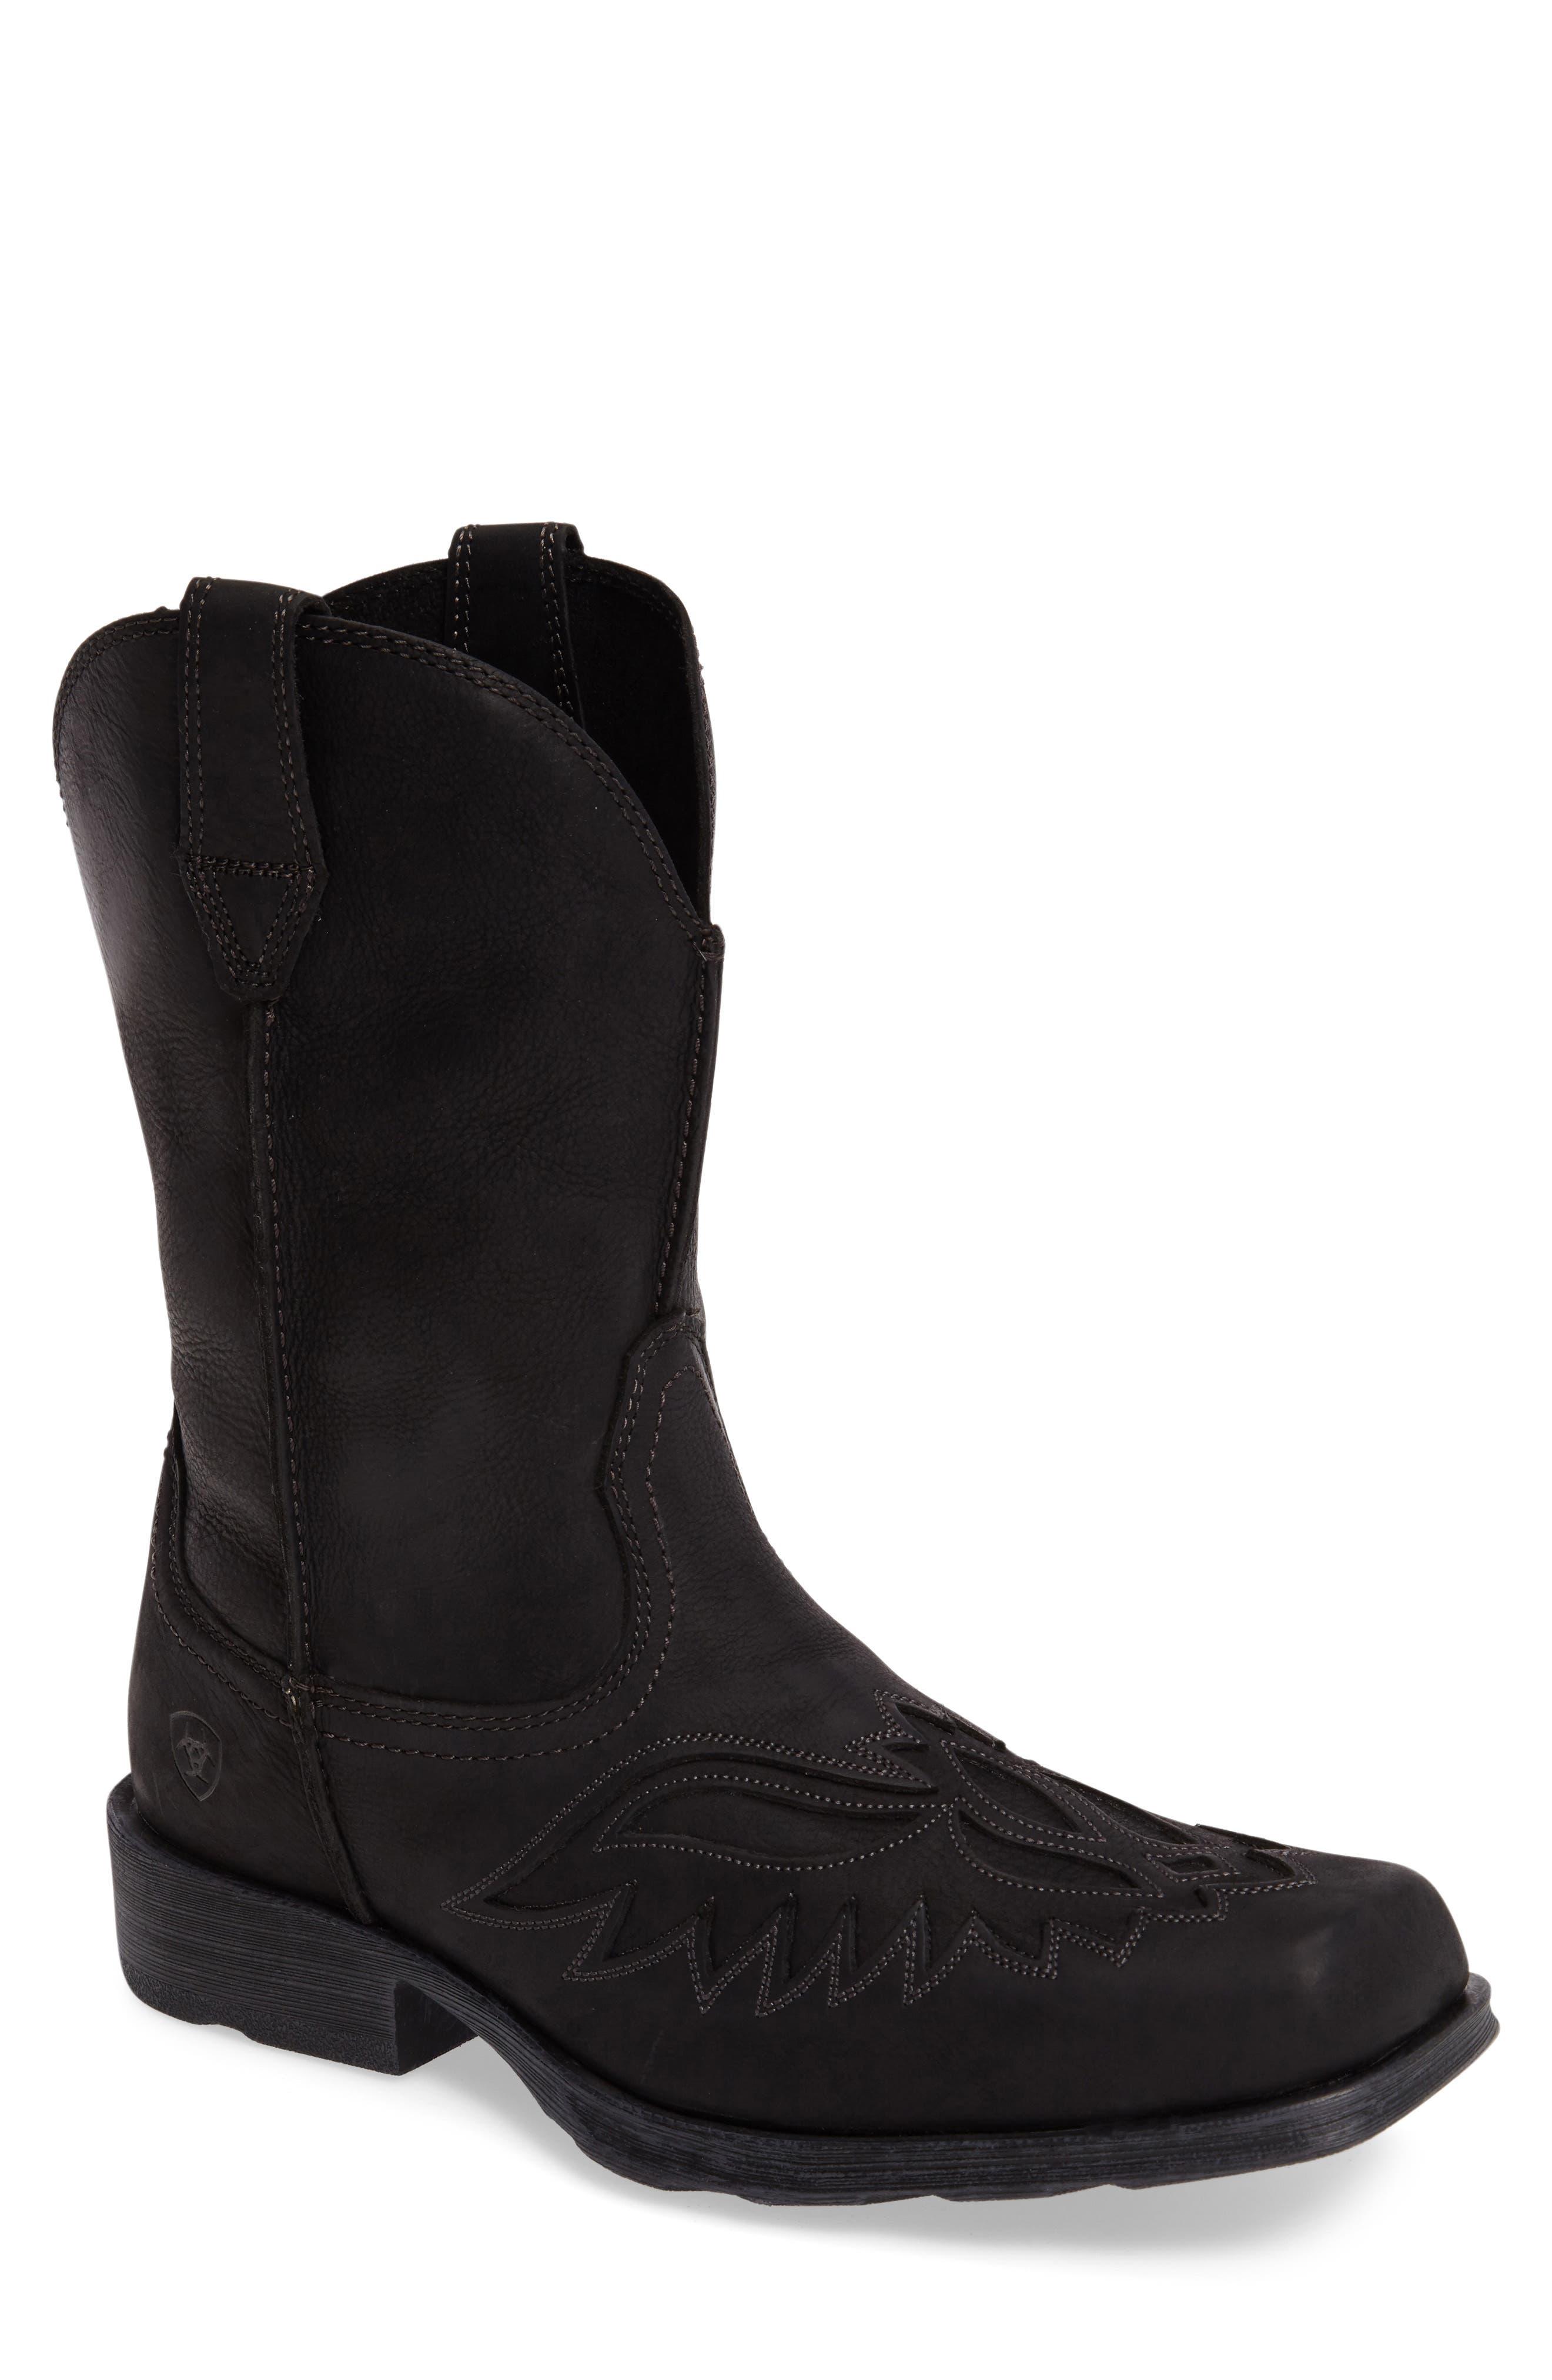 Rambler Renegade Cowboy Boot,                         Main,                         color, BLACK